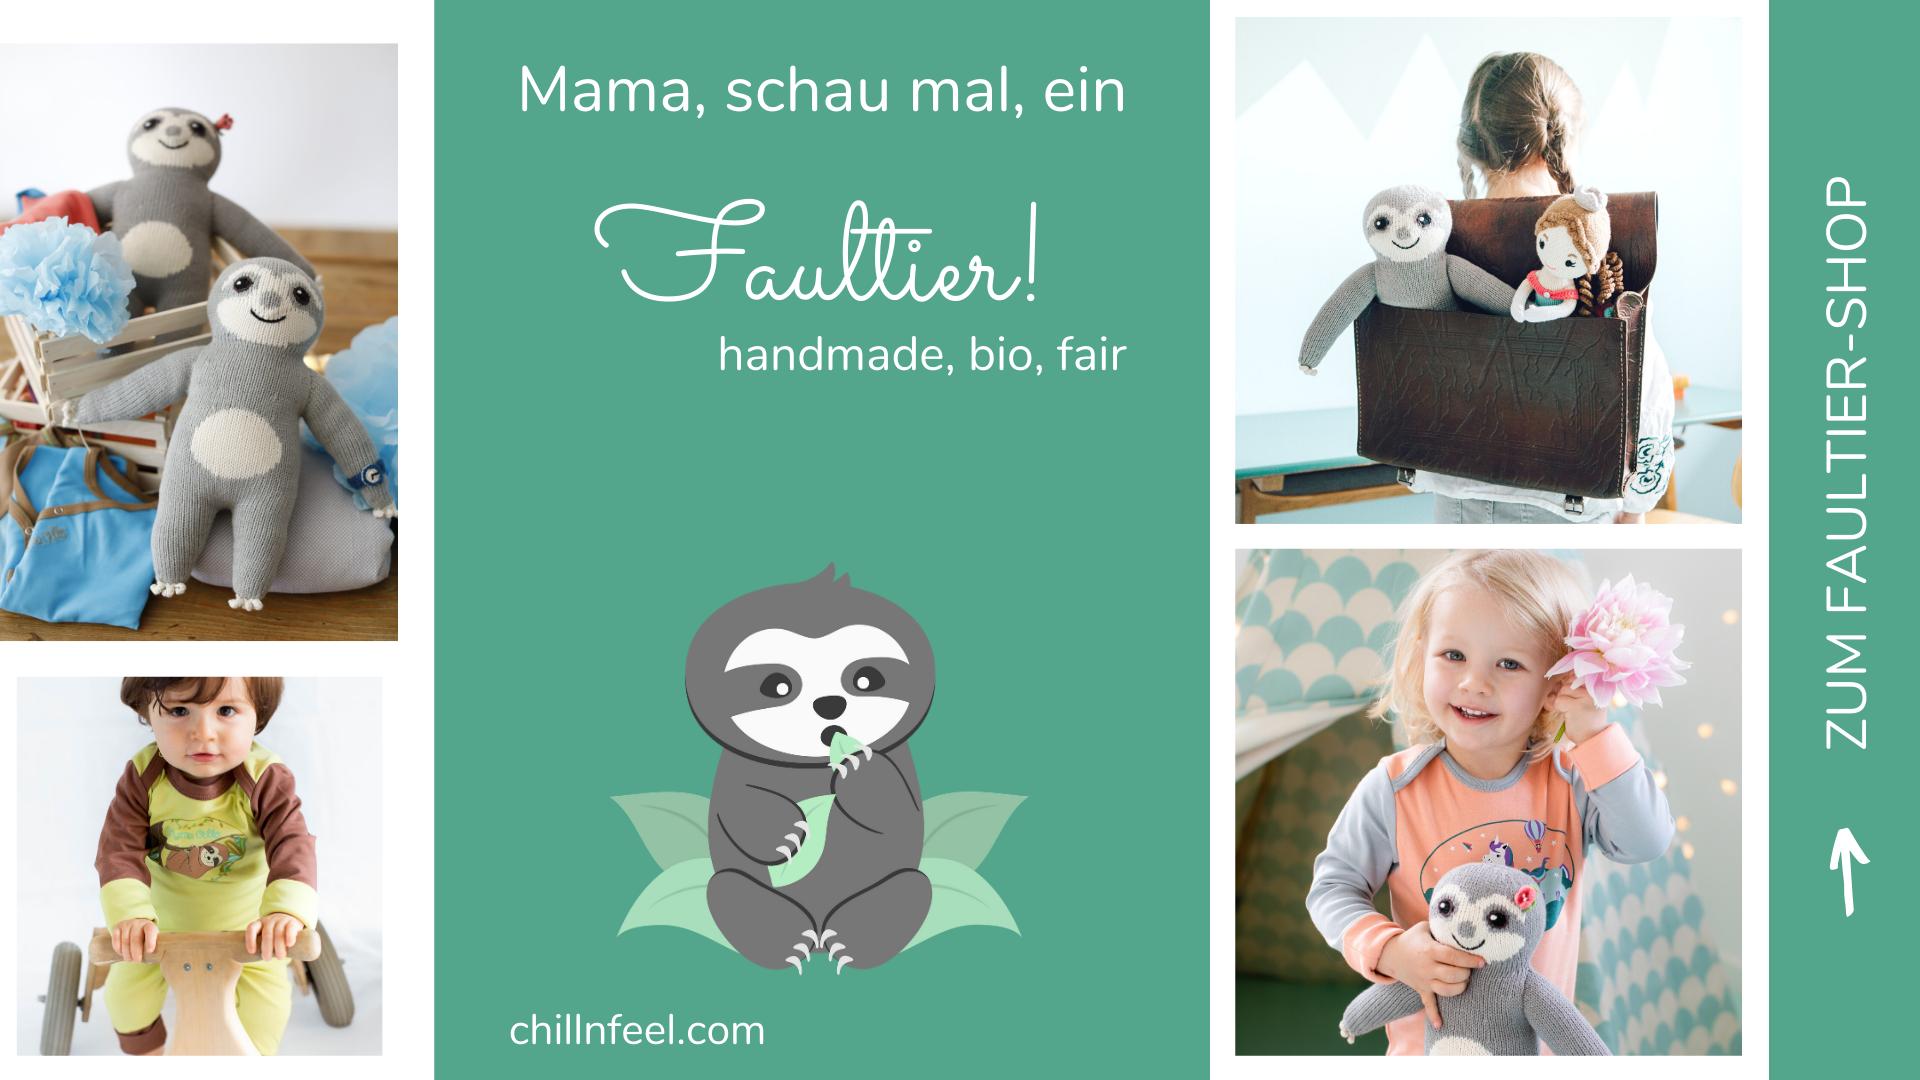 Faultier Kuscheltier_Faultier Geschenke_Chillout_Chill n Feel